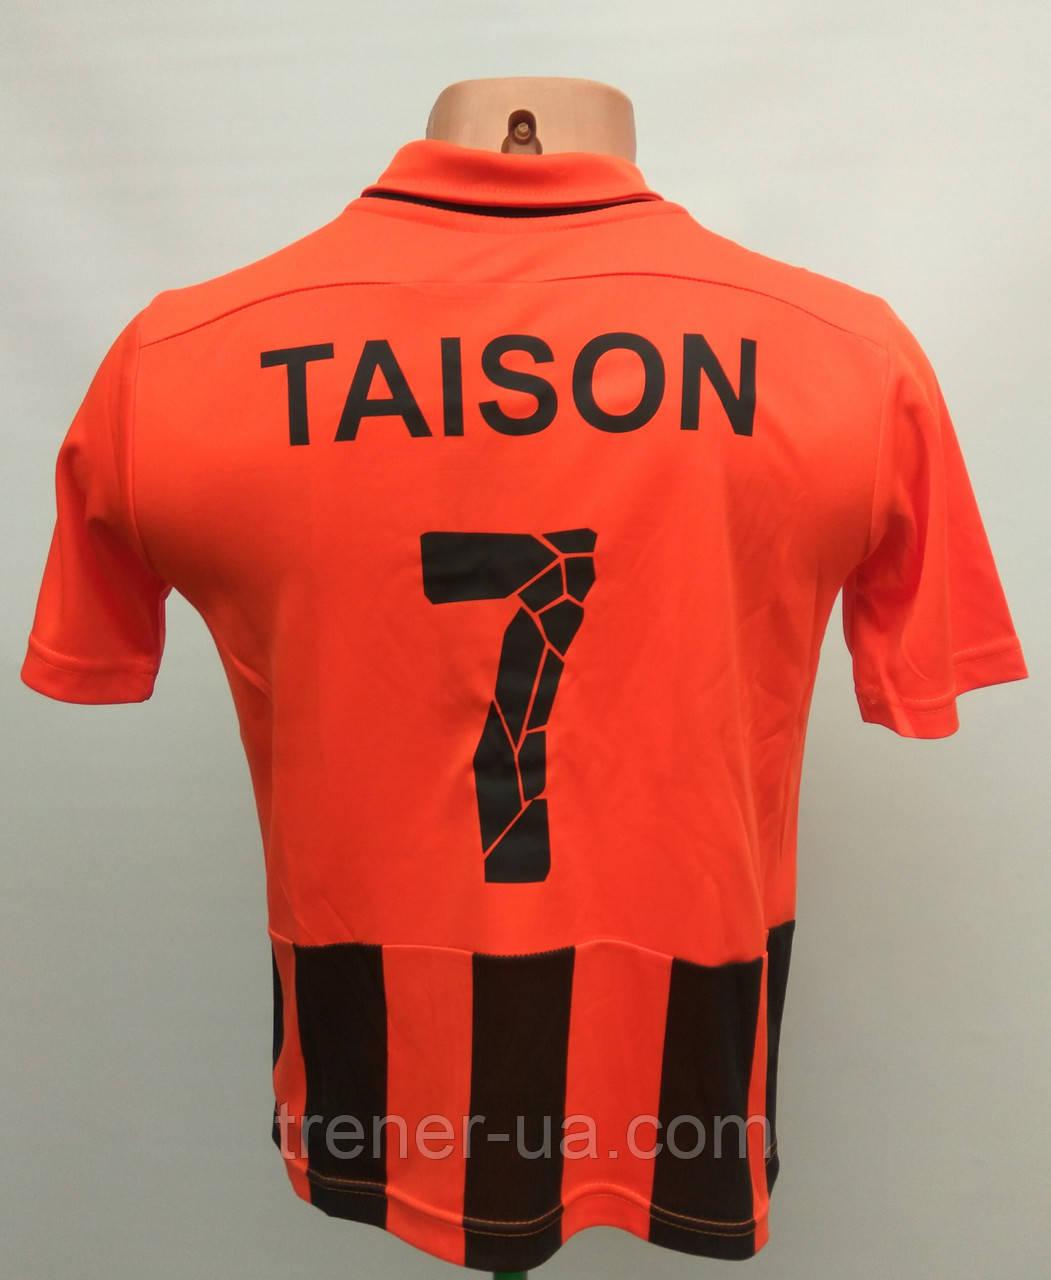 Футбольная форма детская Шахтер Тайсон оранжевая